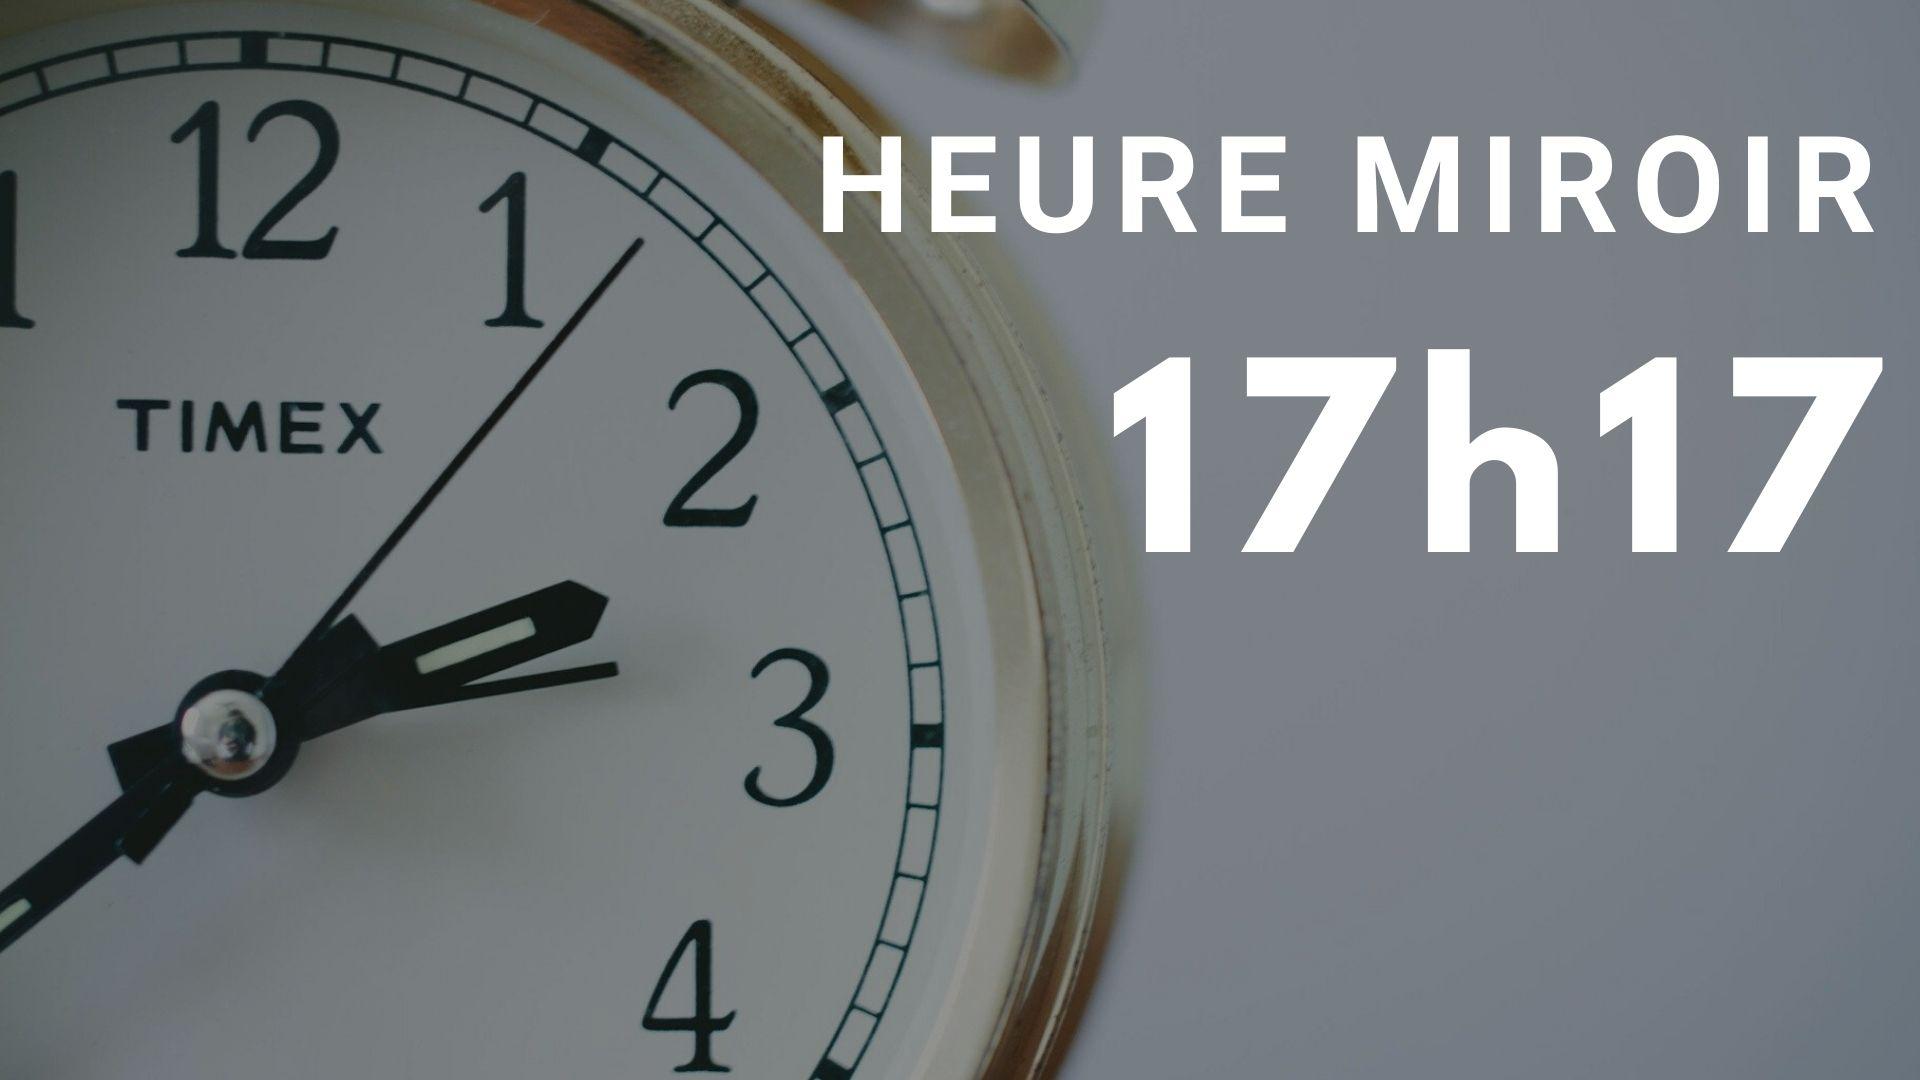 heure miroir 17h17